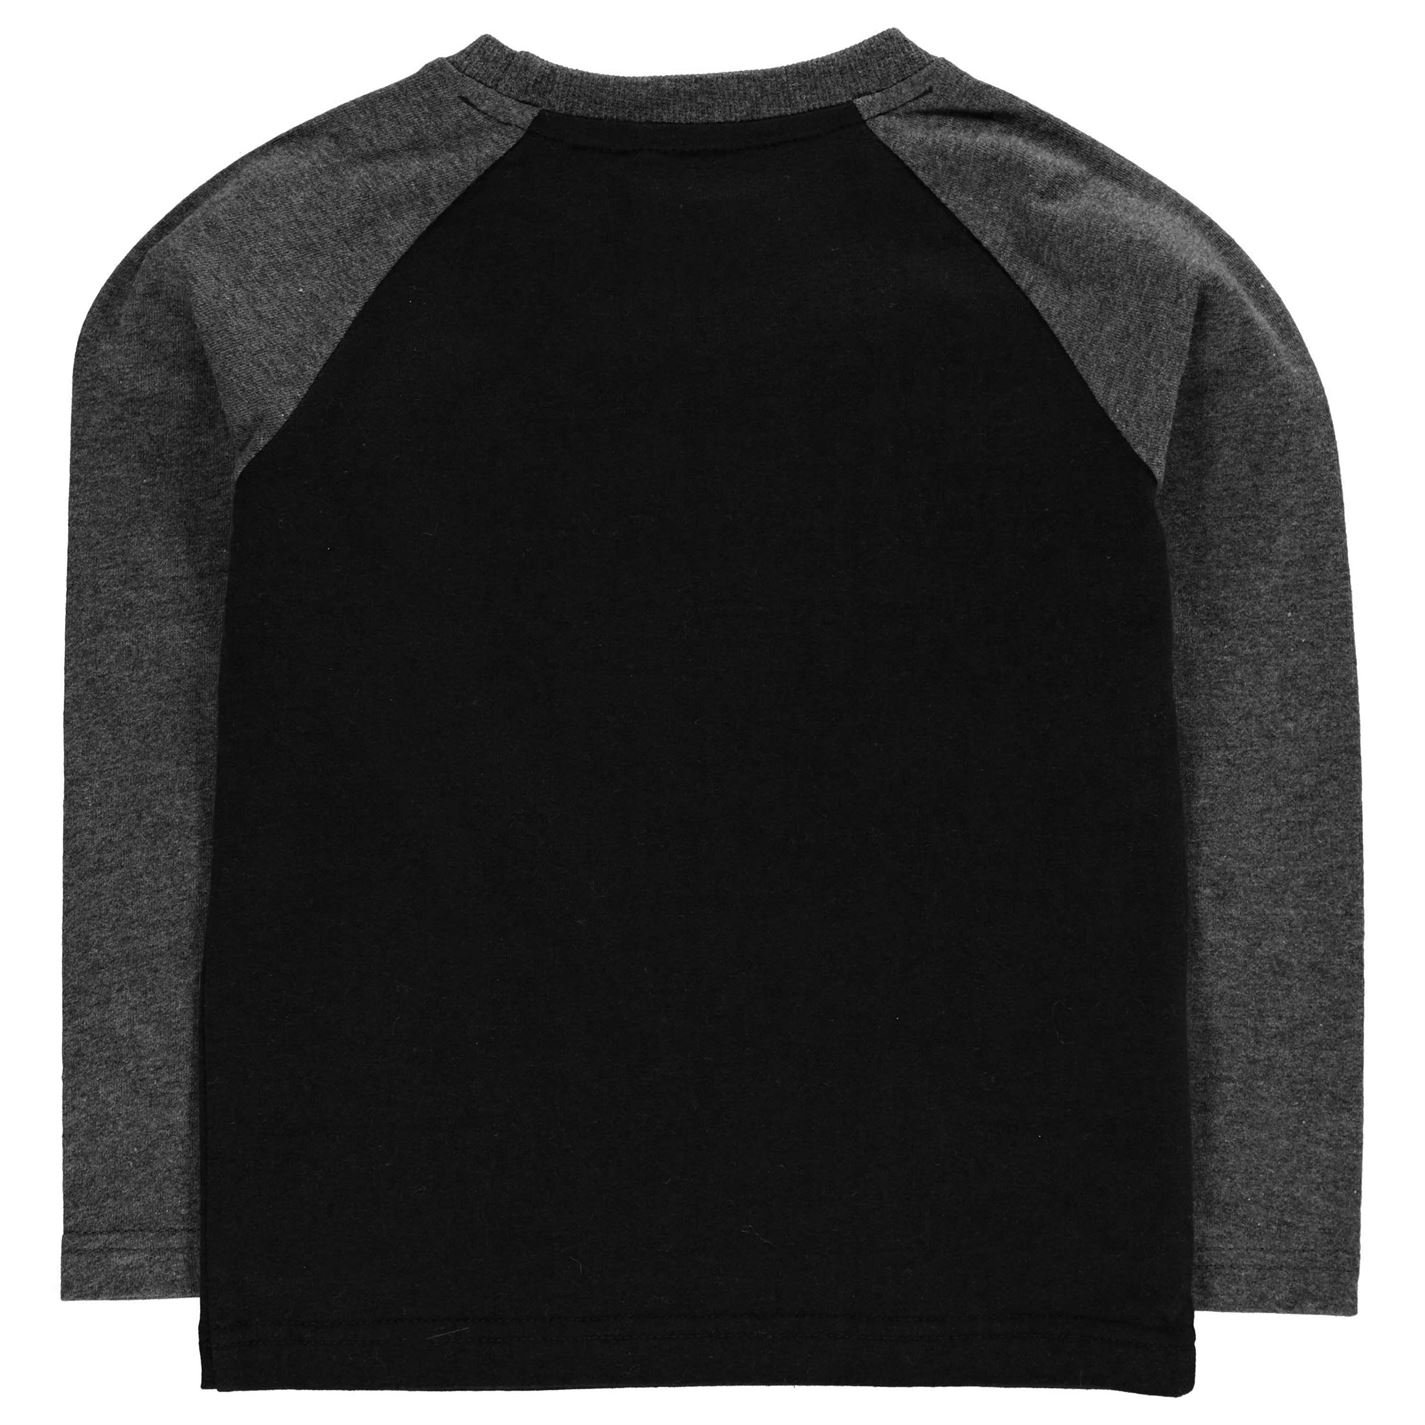 Lonsdale Niños Crst Top Camiseta Manga Larga Negro/Carbón 5-6 años ...